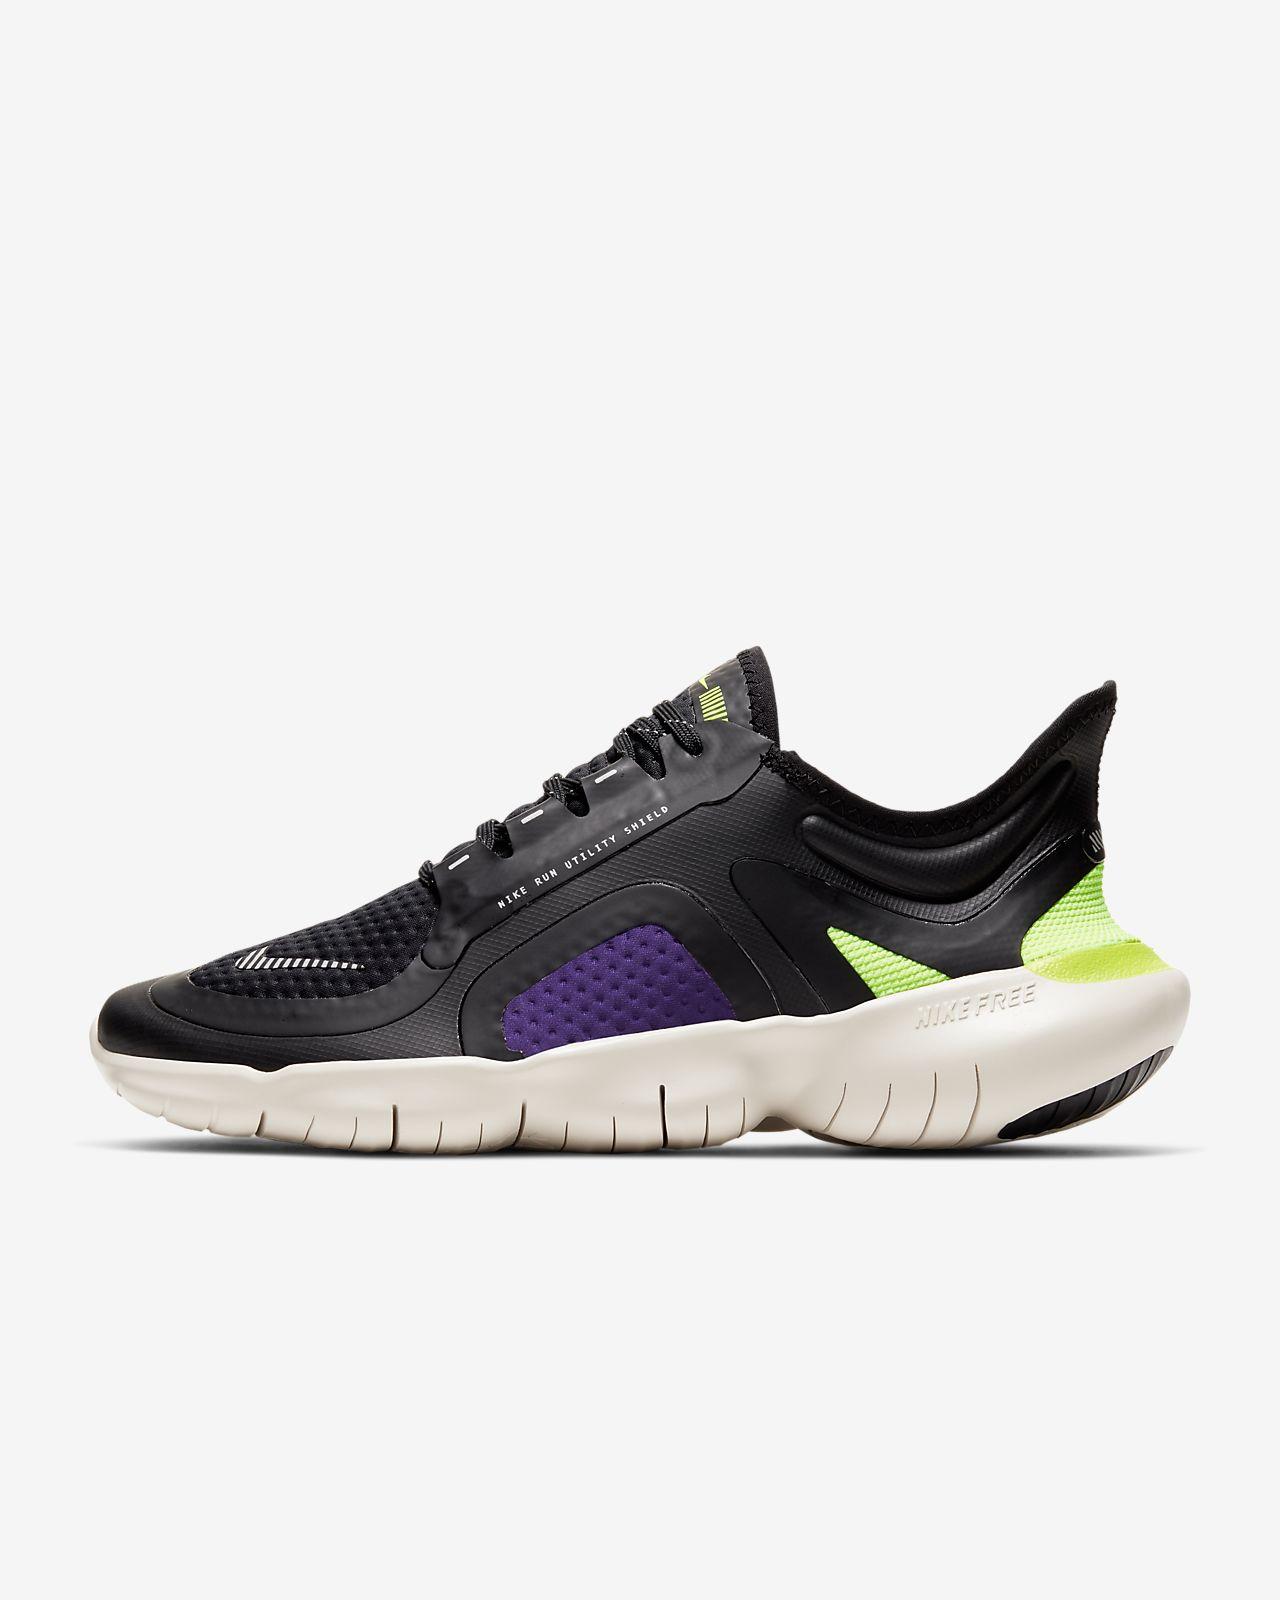 Nike Free RN 5.0 Shield 女子跑步鞋